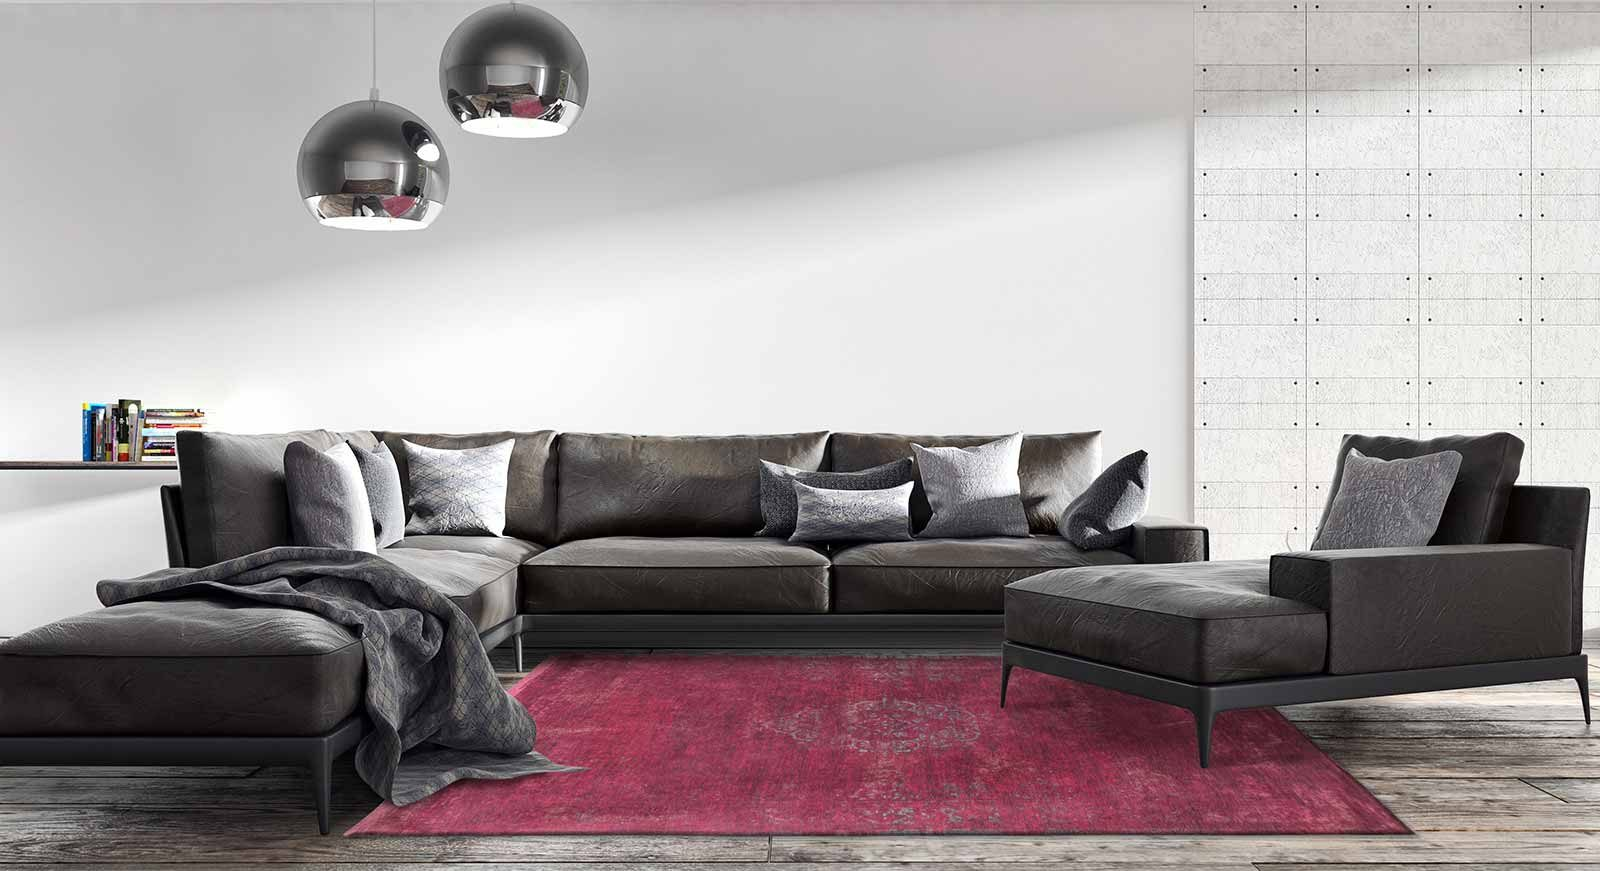 vloerkleed Louis De Poortere LX8260 Fading World Medaillon Scarlet interior